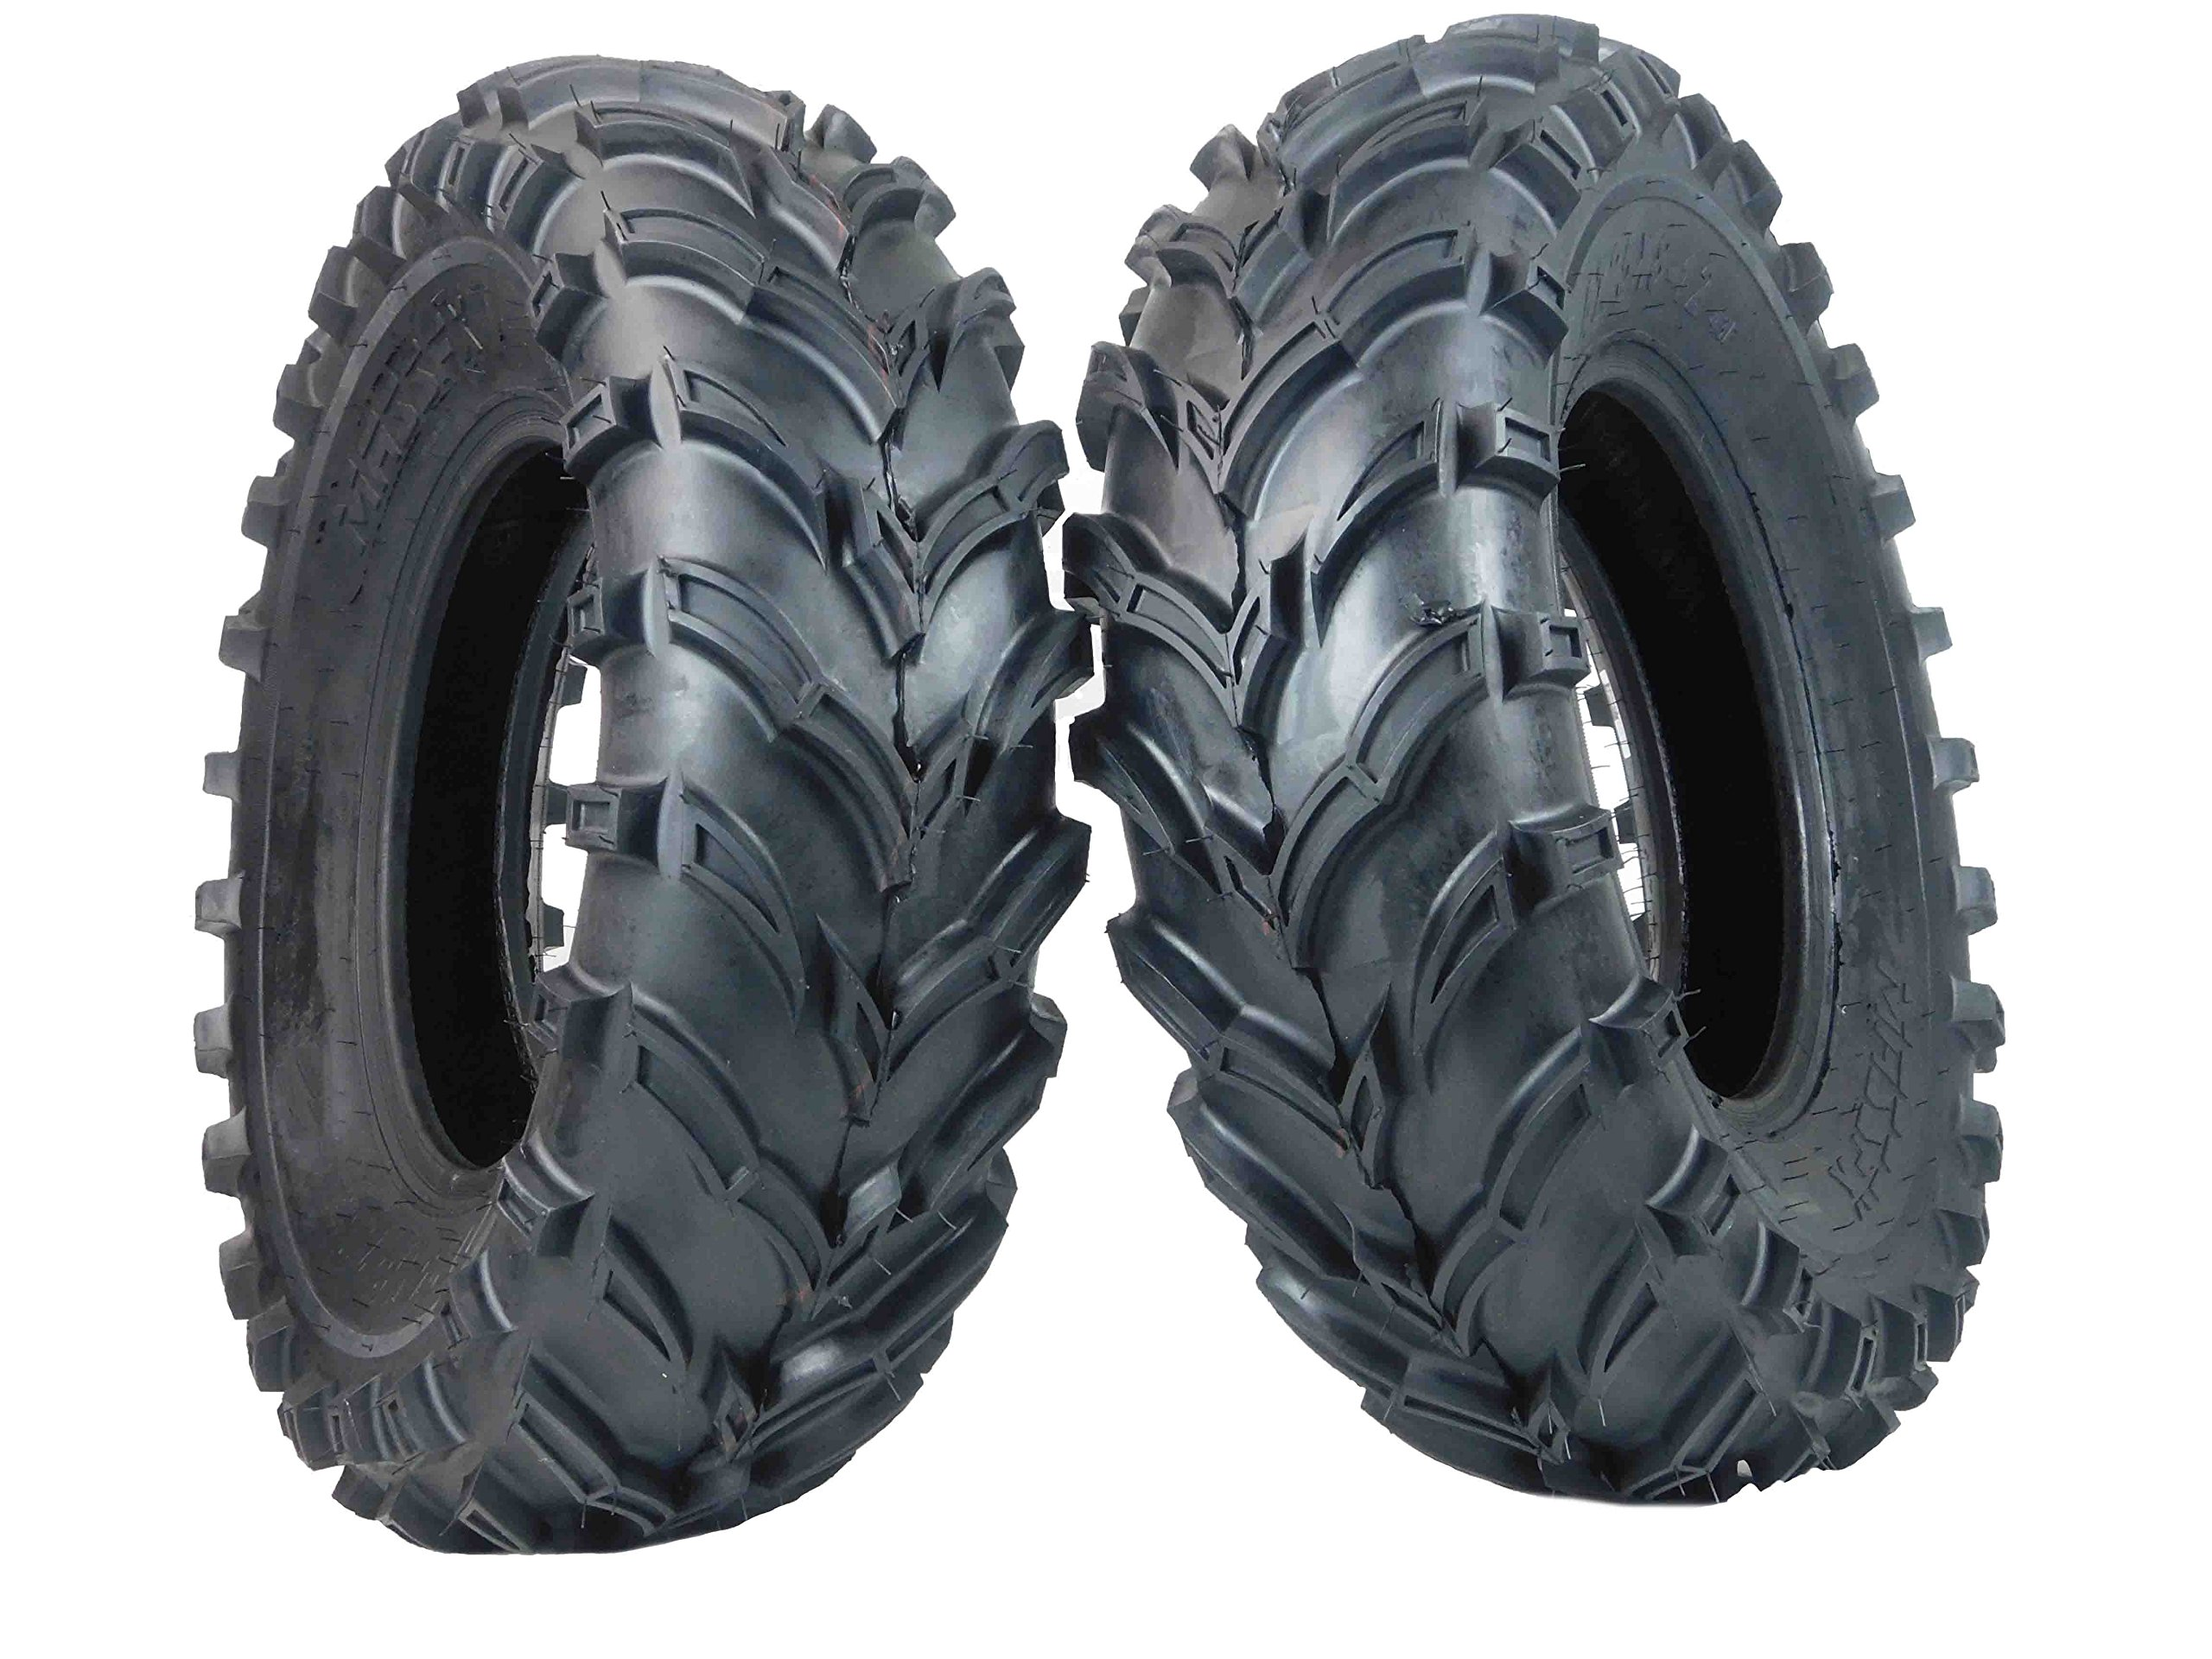 One Pair of MassFx P377 ATV/UTV Front Tires 25x8-12 Front Set of 2 25x8x12